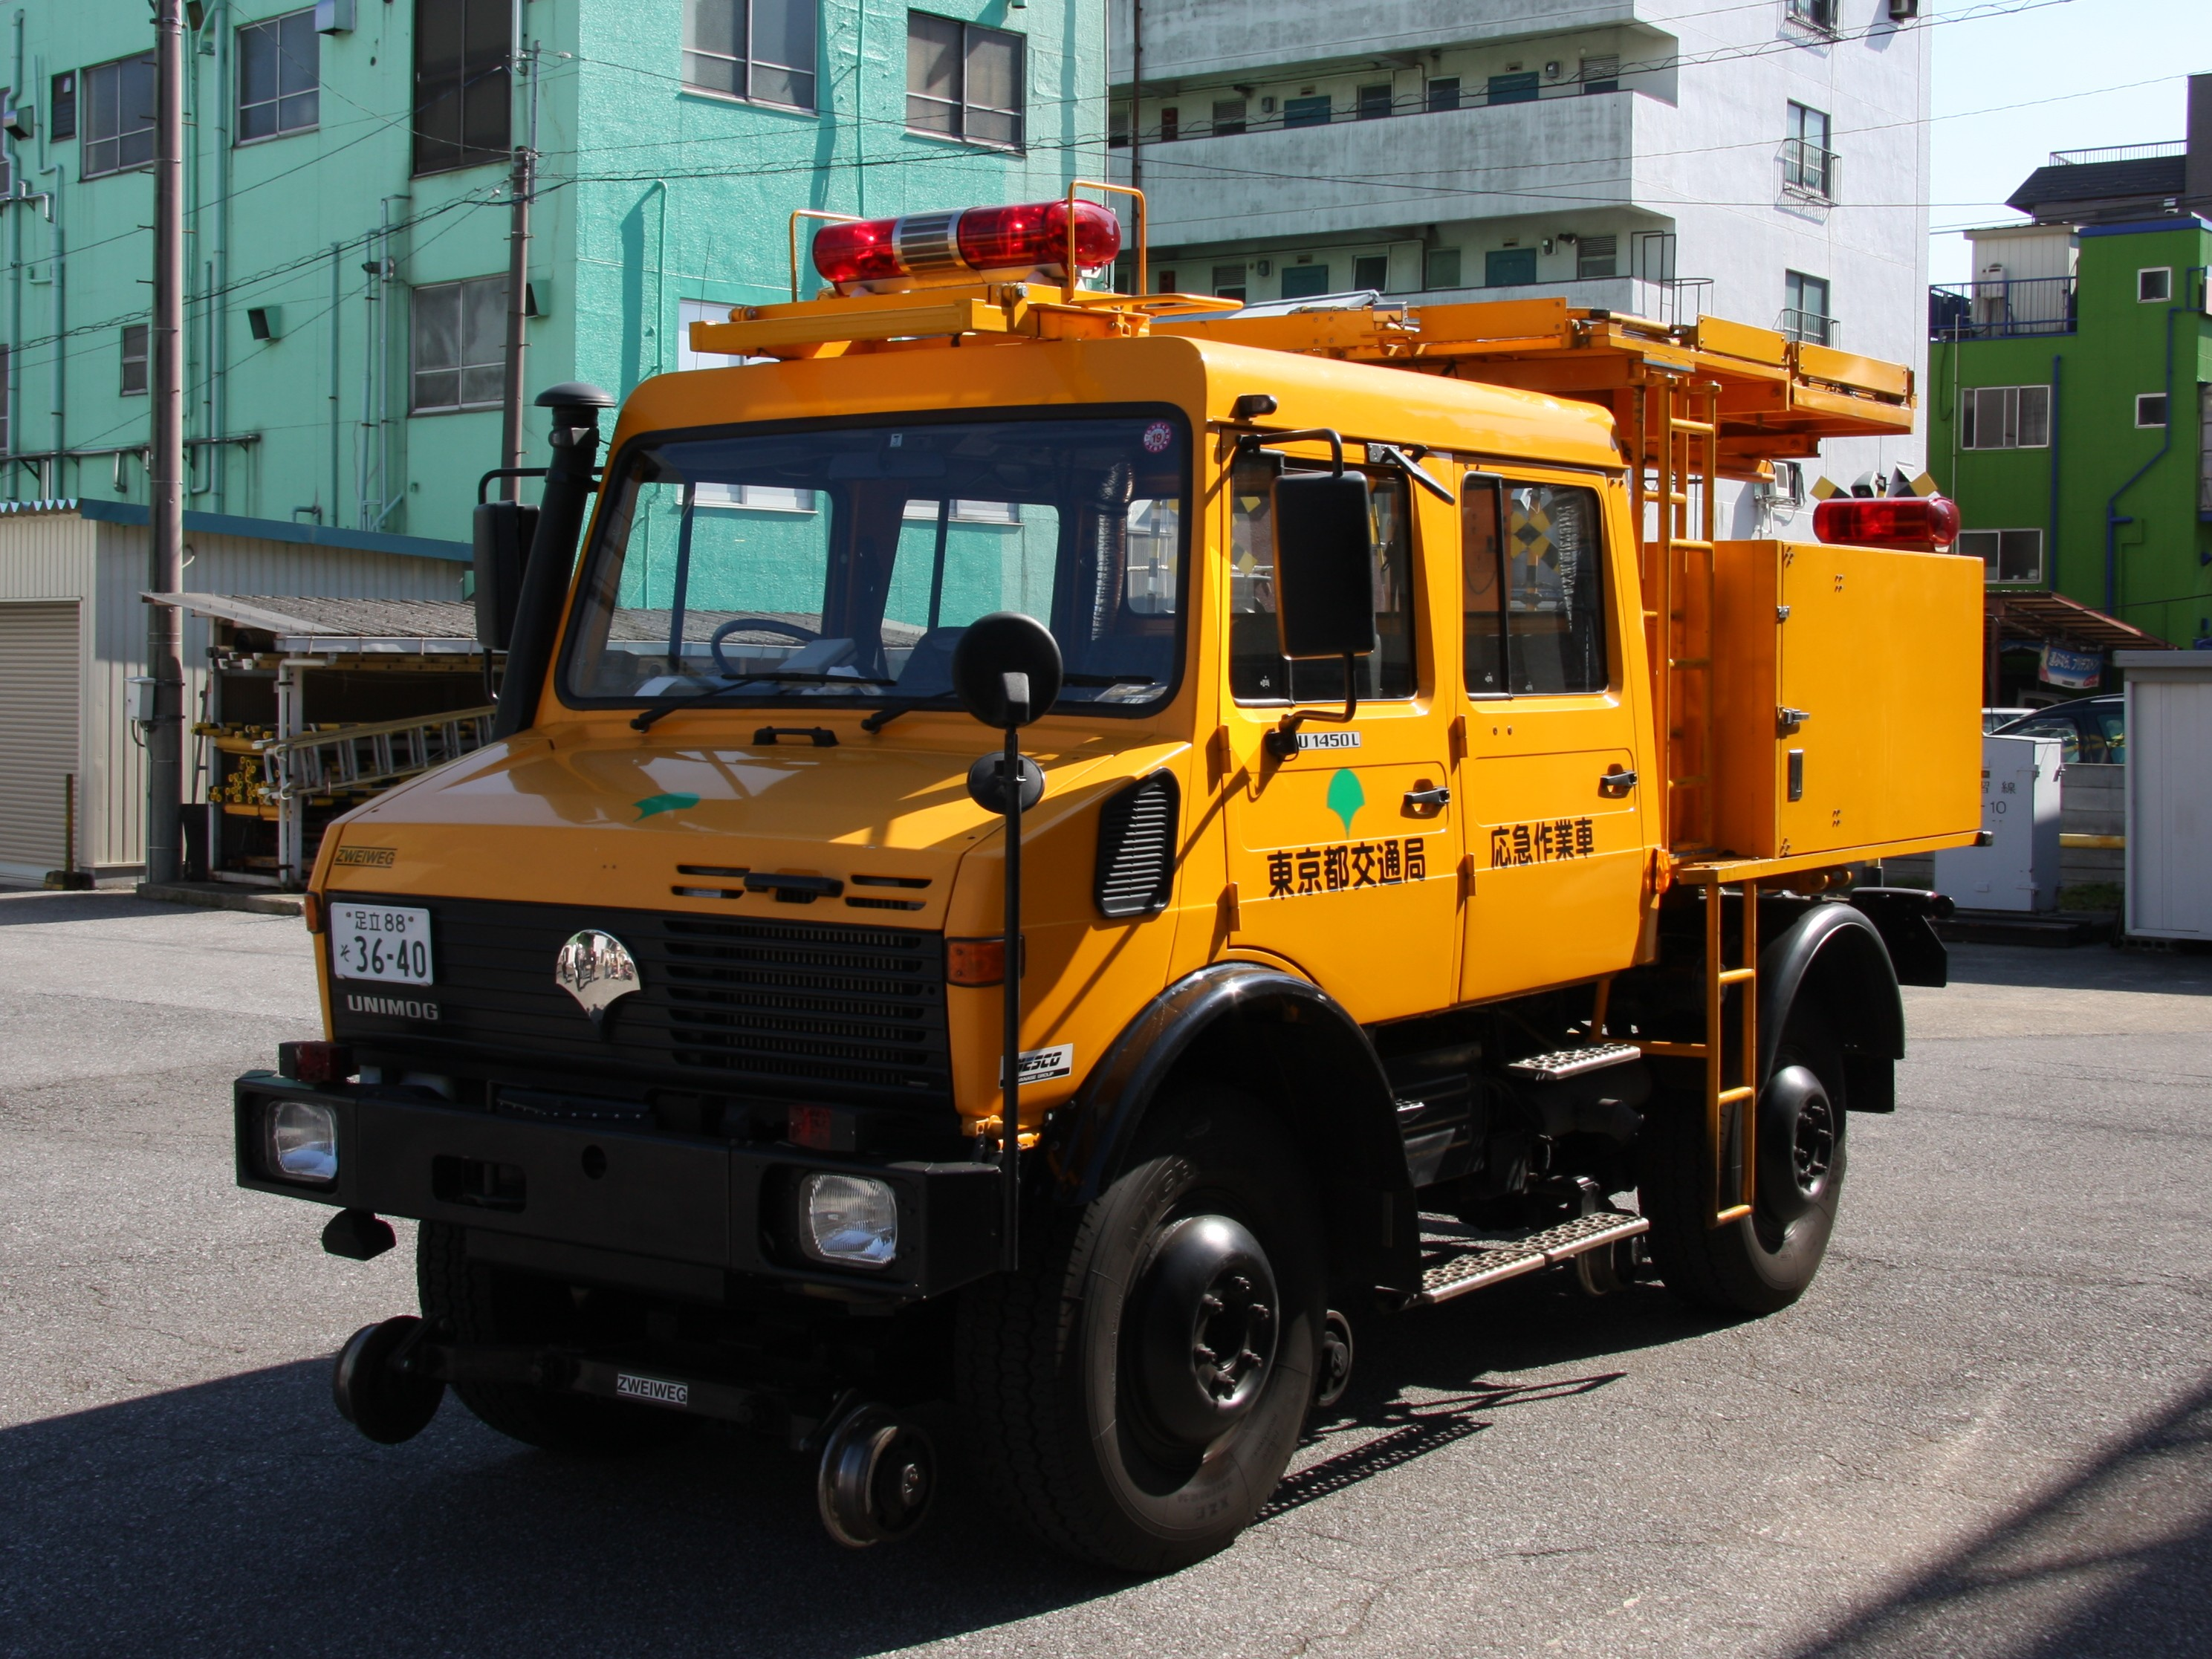 File:Tokyo Trams inspection vehicle - Mercedes-Benz UNIMOG ZWEIWEG.jpg - Wikimedia Commons